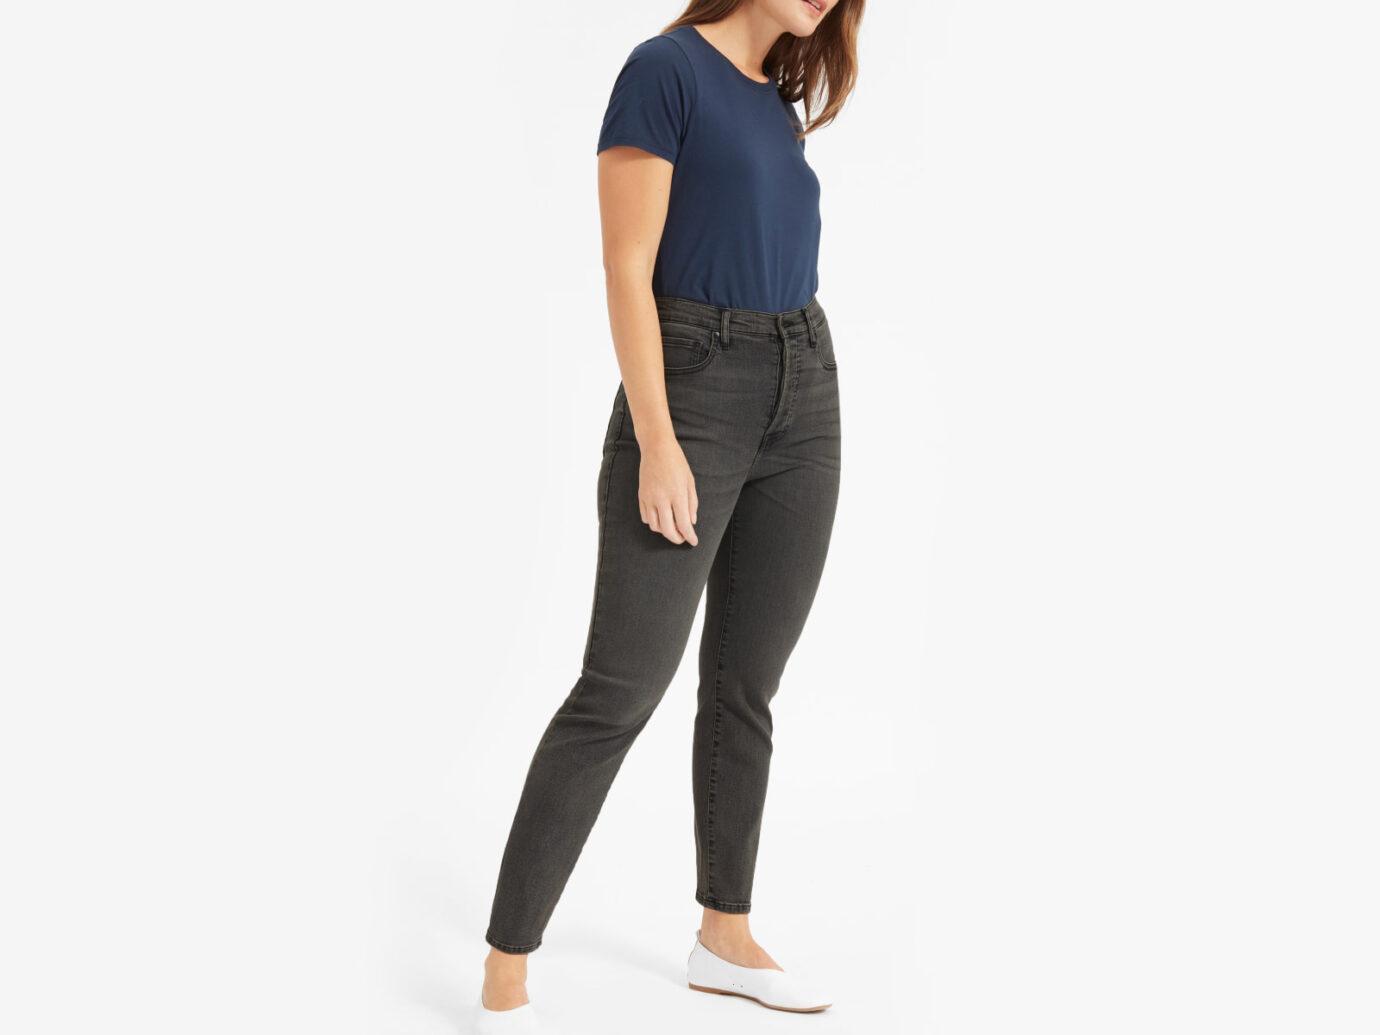 The Authentic Stretch High-Rise Cigarette Jean